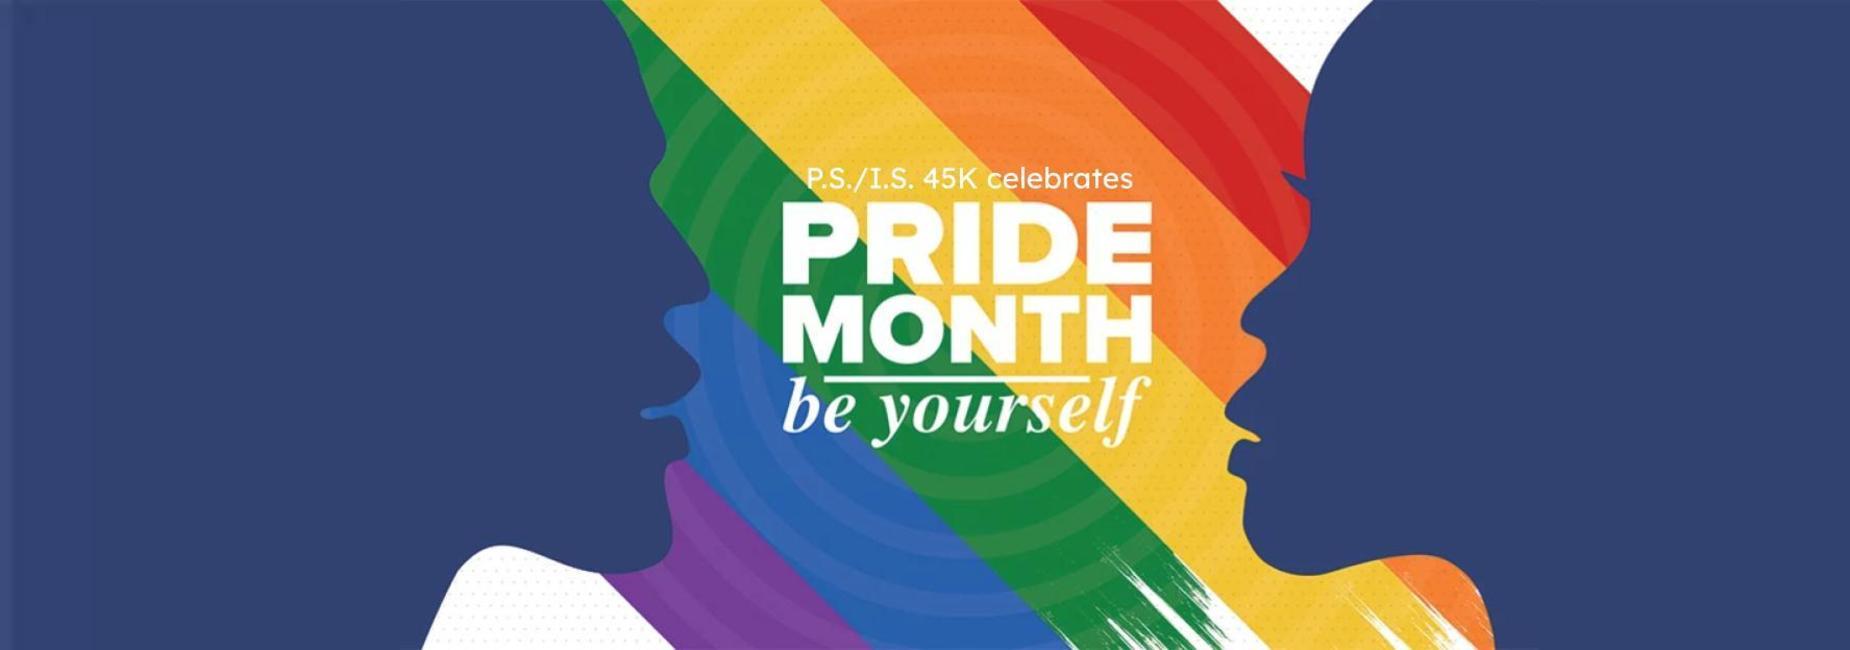 PS/IS 45K Celebrates Pride Month - June 2021